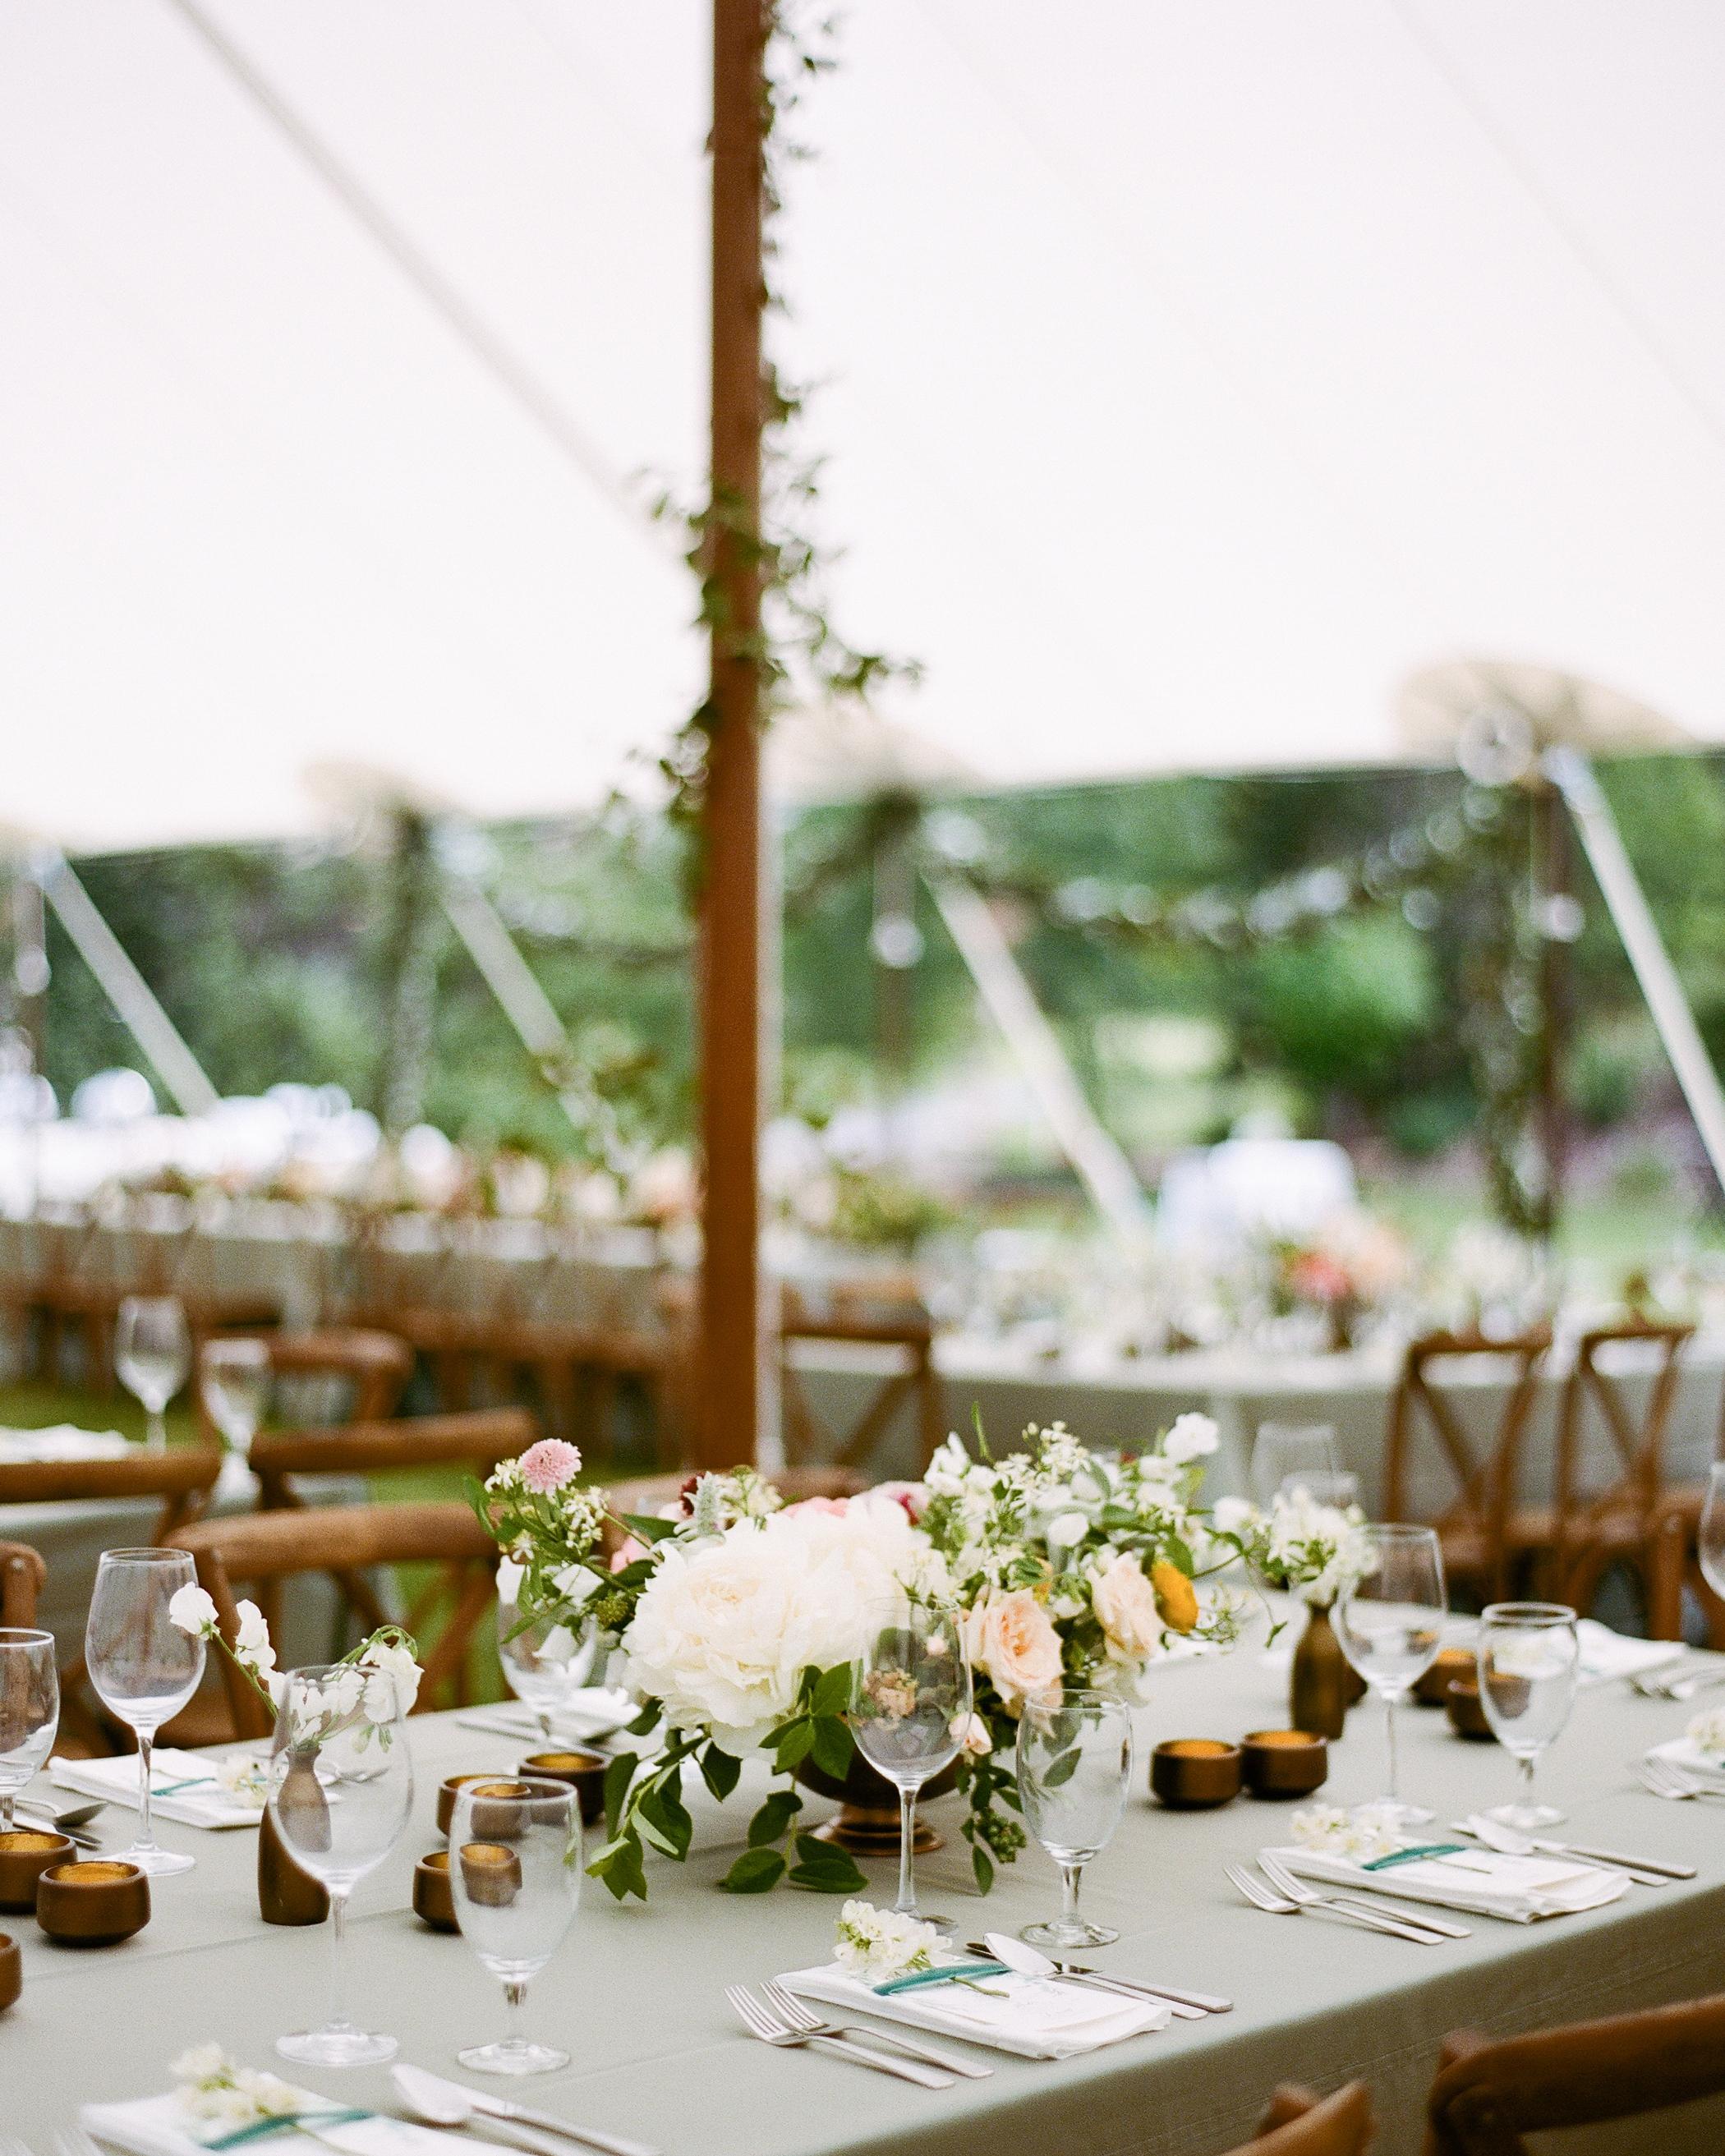 jamie-alex-wedding-tables-227-s111544-1014.jpg